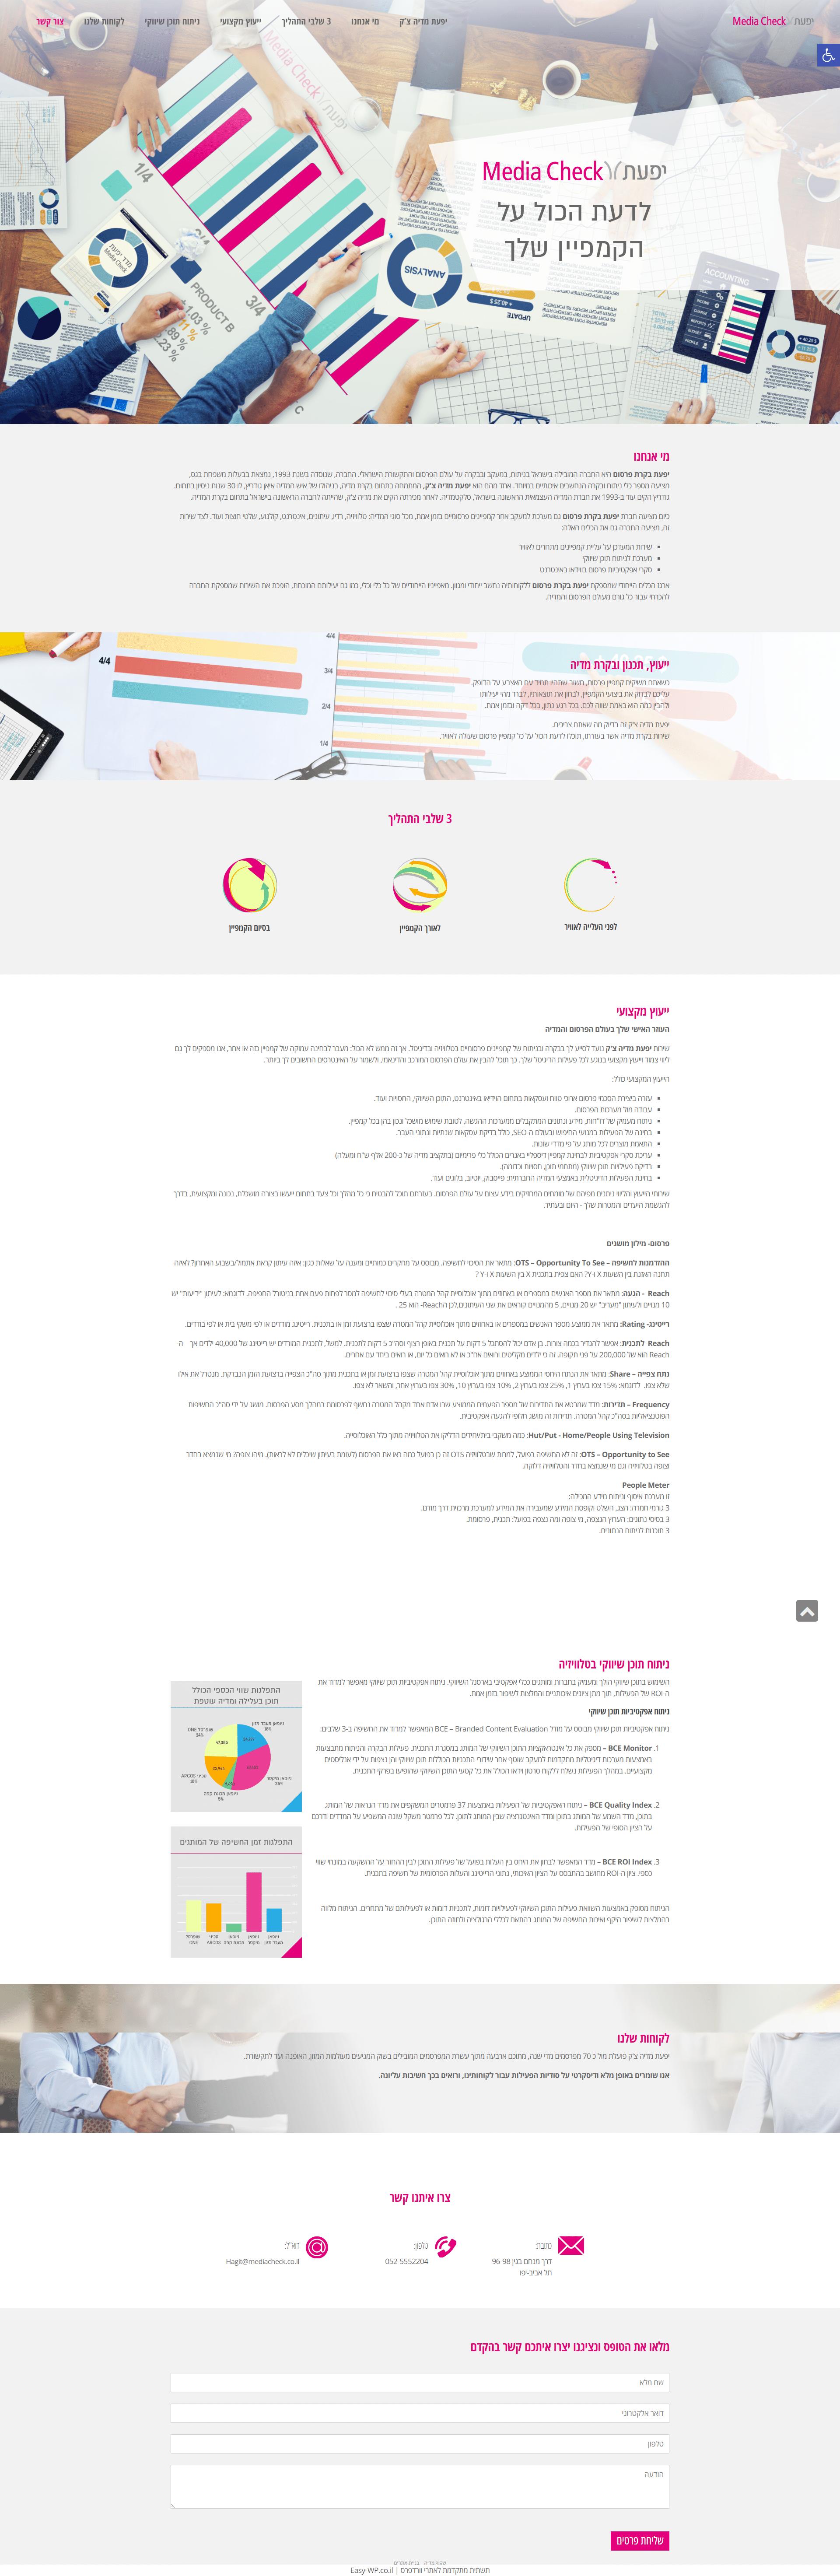 1ifatmediacheck.co.il